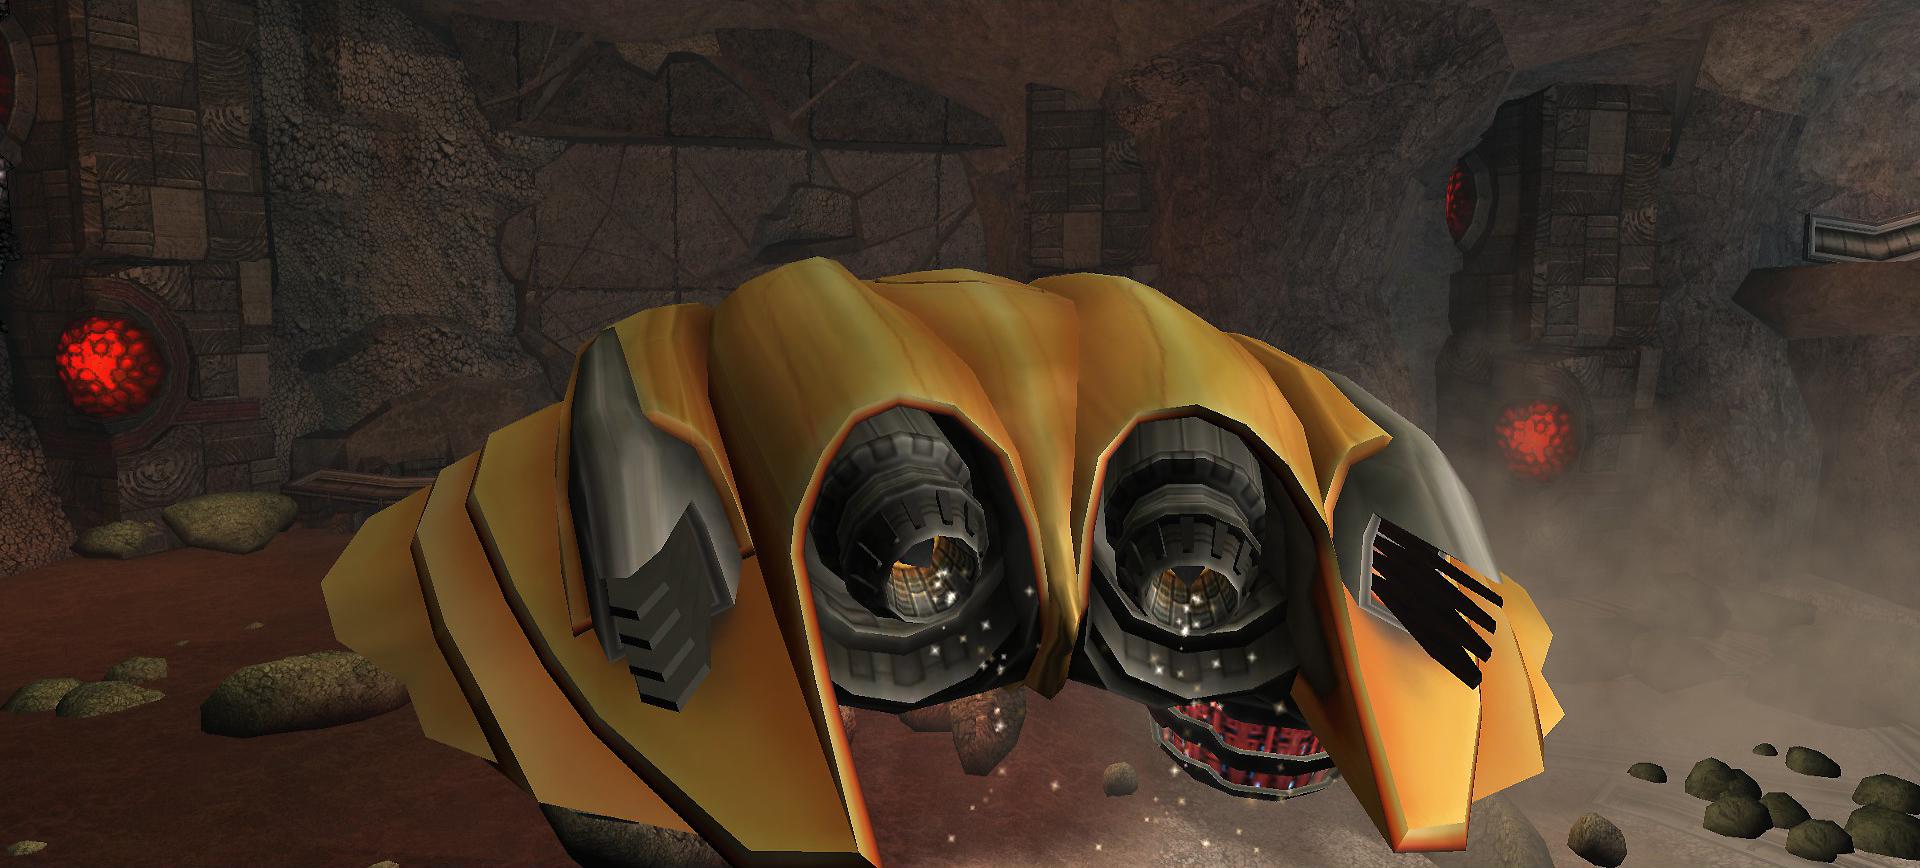 Image result for Metroid crash landing